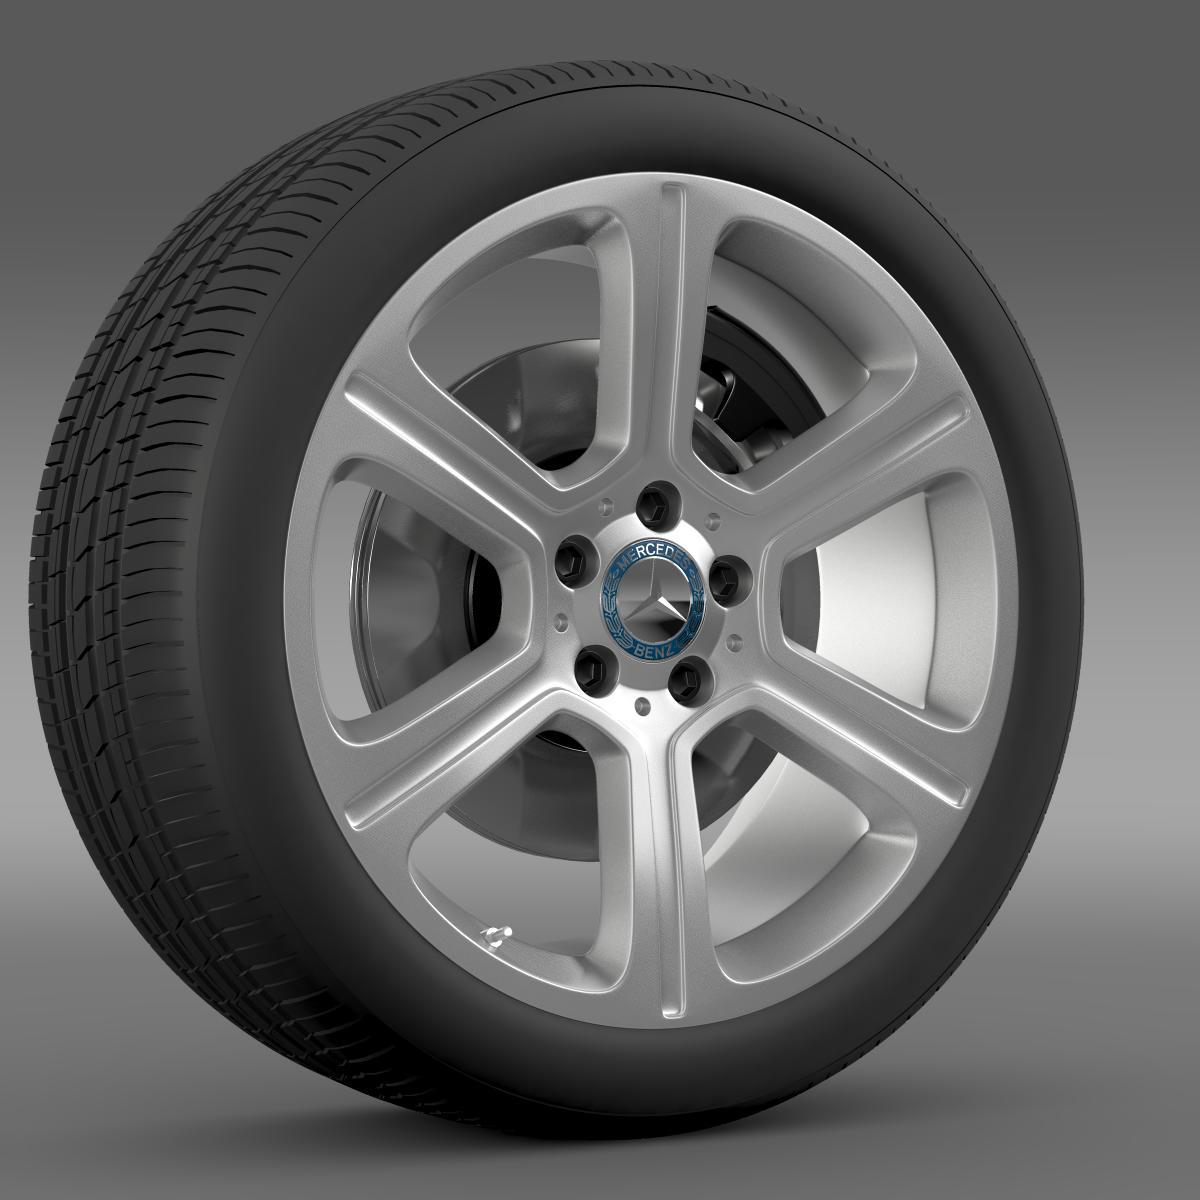 mercedes benz c 300 exclusive line wheel 3d model 3ds max fbx c4d lwo ma mb hrc xsi obj 210772